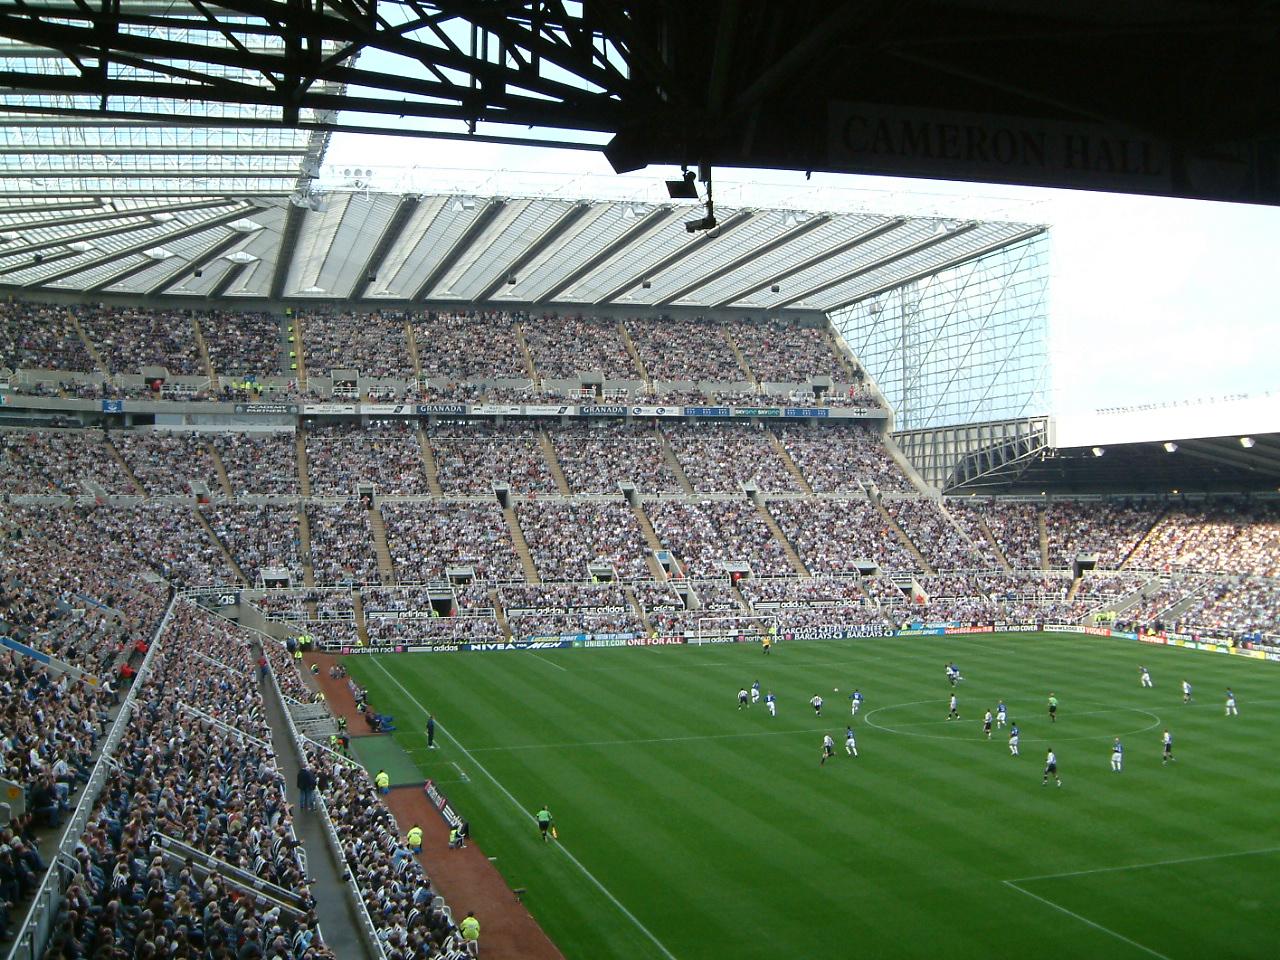 Intip Kemegahan Stadion St. James Park, Rahasia Dibalik Keuntungan Newcastle United 4